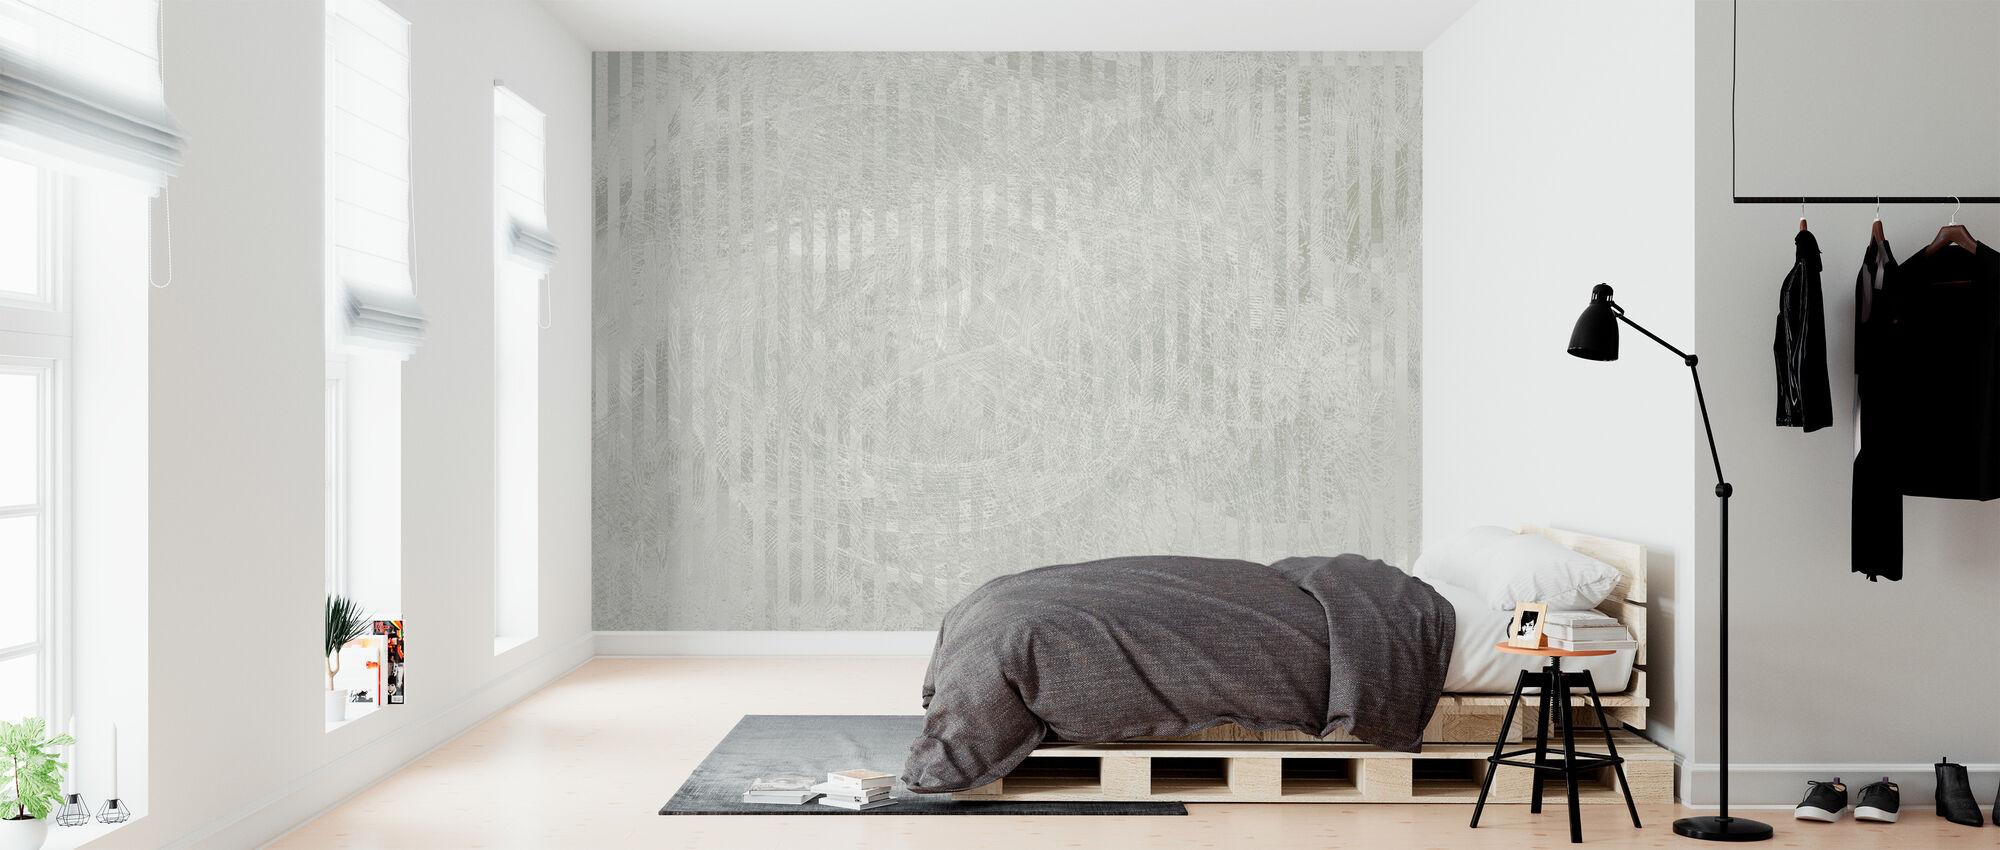 Specular Reflection - Grey - Wallpaper - Bedroom